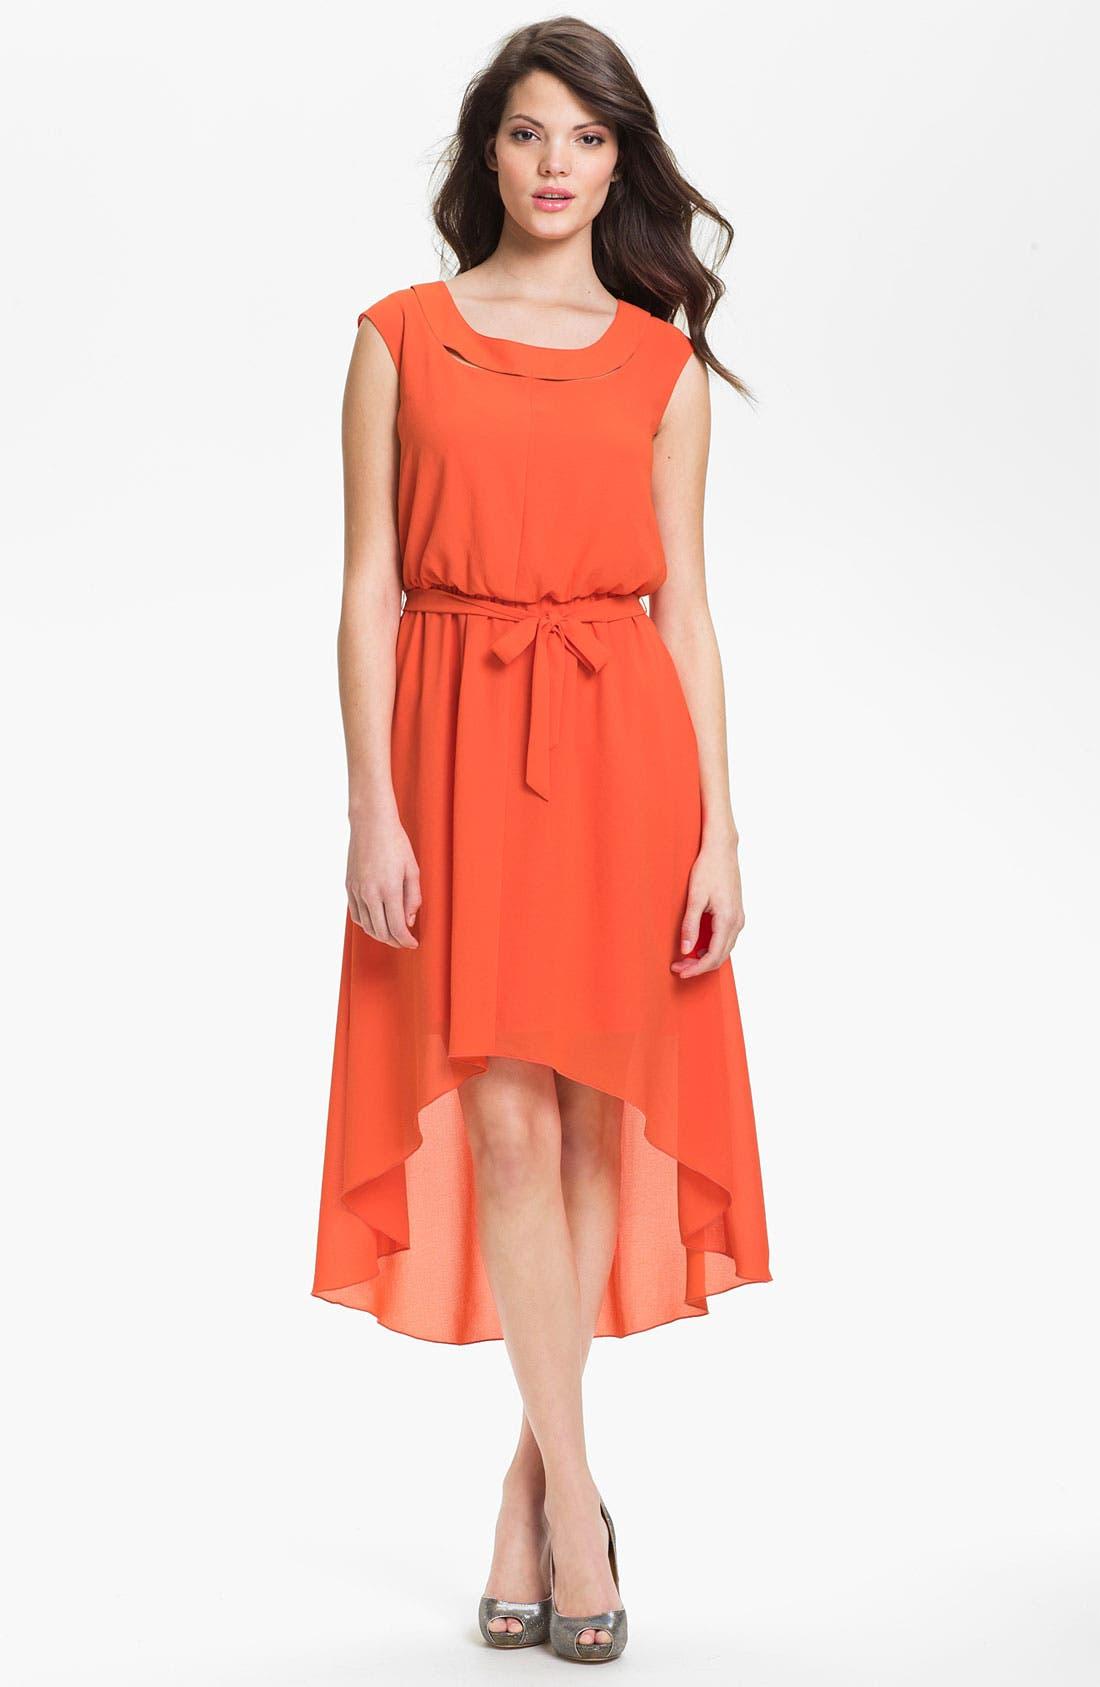 Alternate Image 1 Selected - Jessica Simpson Blouson High/Low Crepe Dress